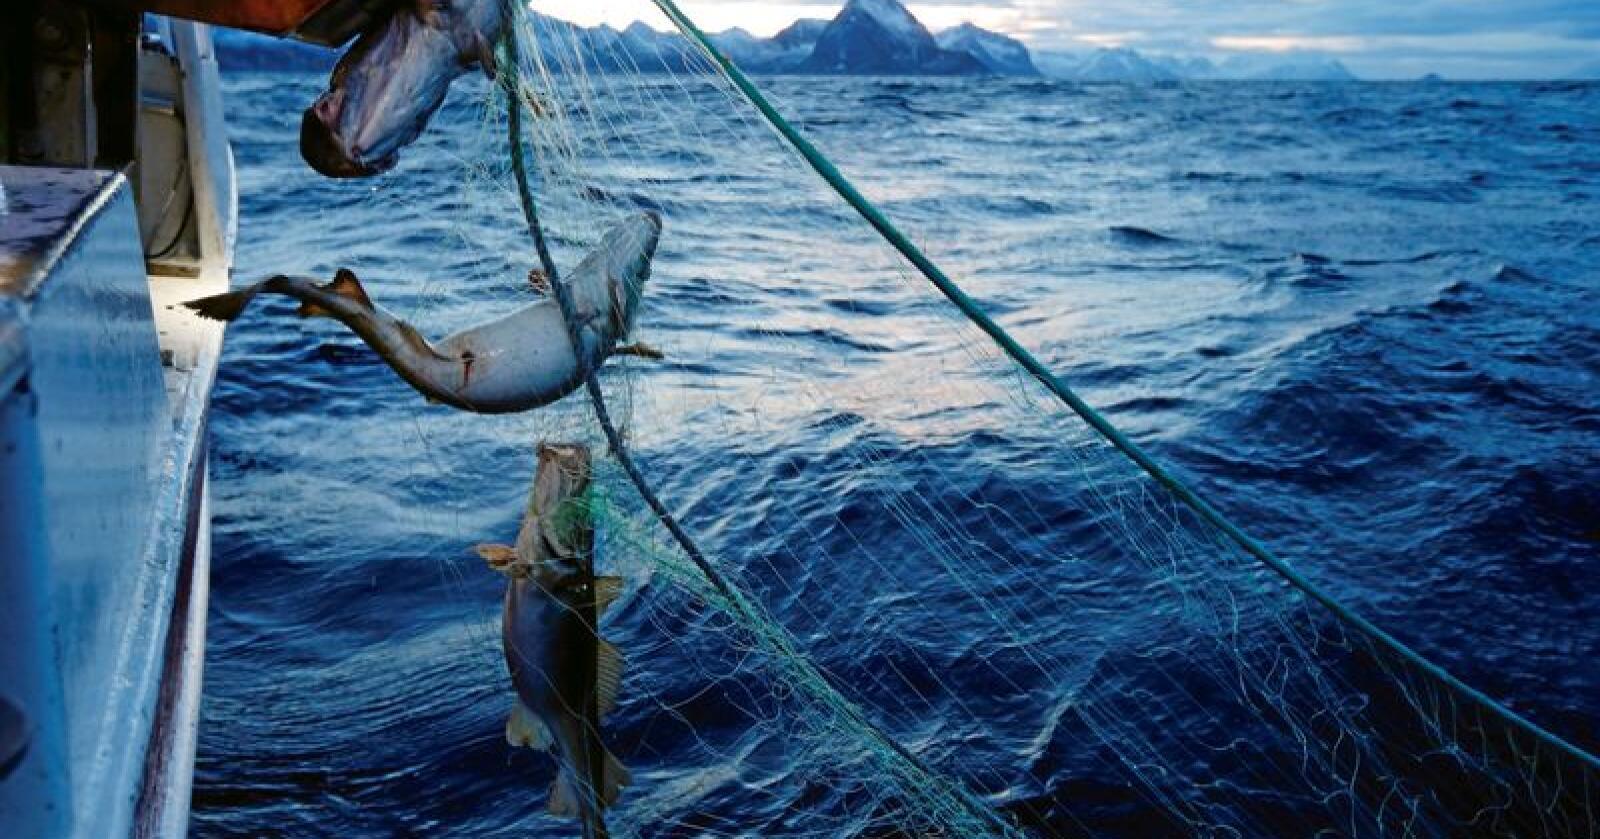 Fiskeri: Blir sentralisert, skriver Geir Pollestad. Foto: Cornelius Poppe / NTB scanpix